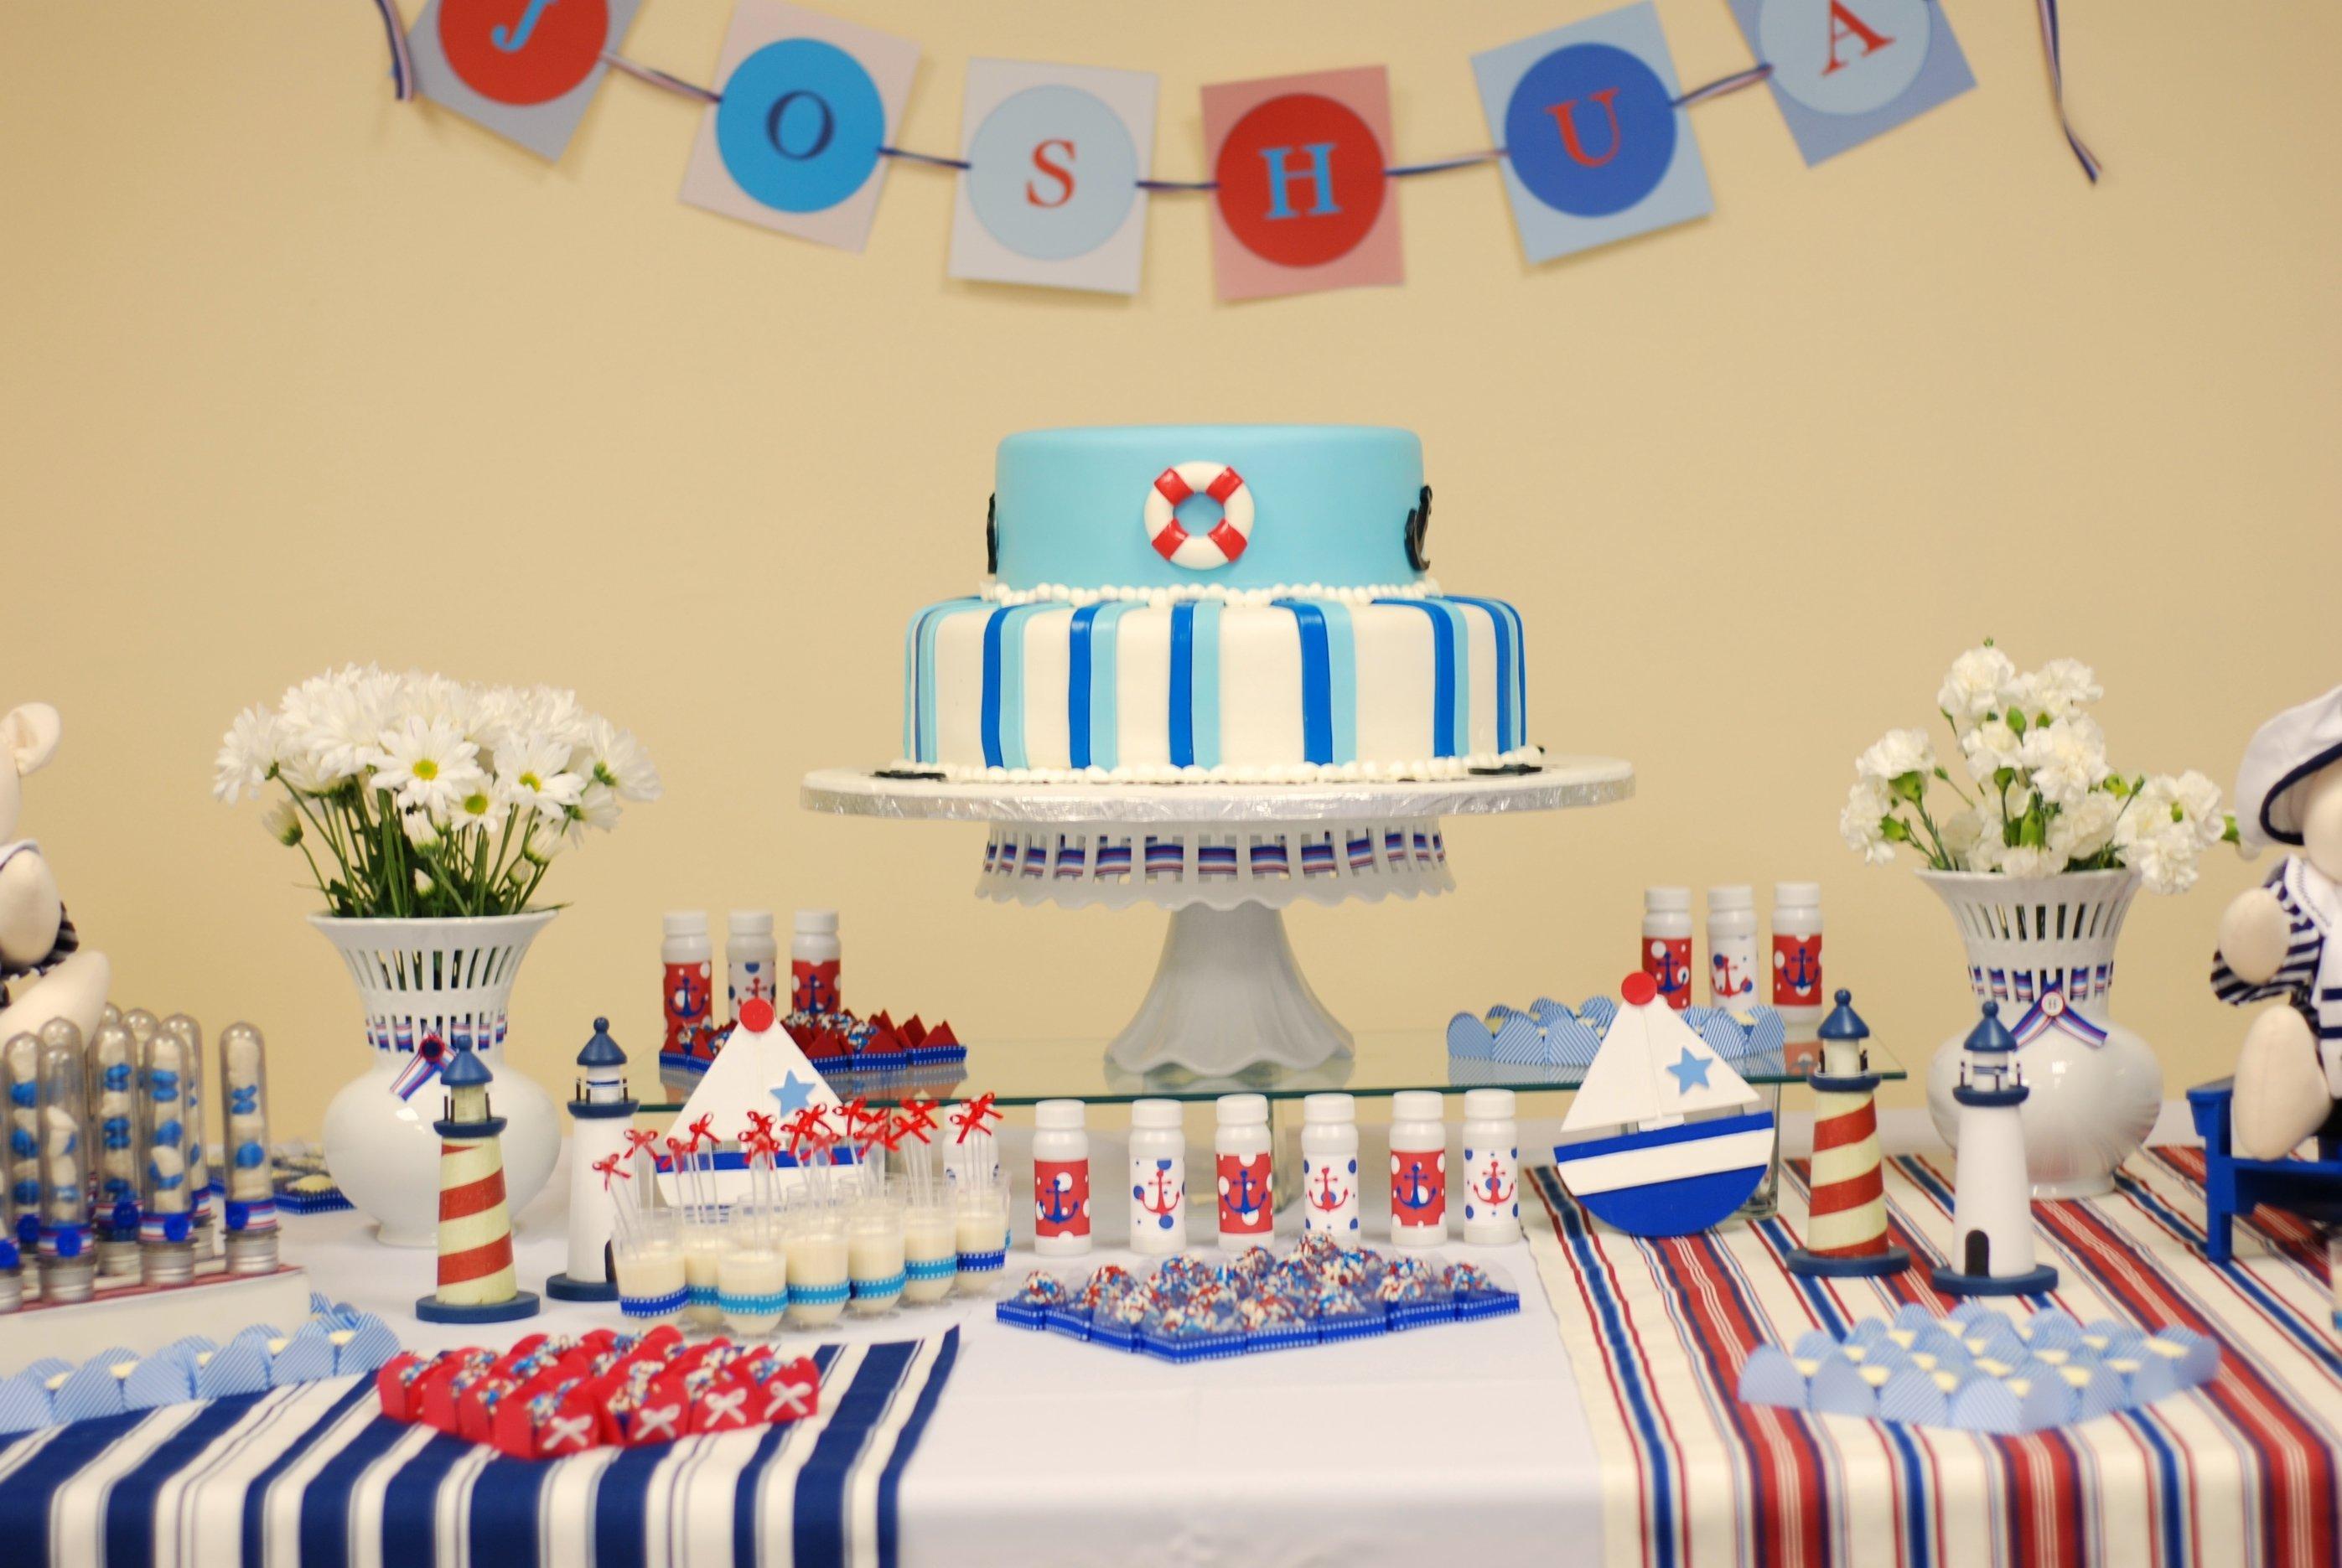 10 Most Popular 1St Birthday Party Ideas For Boys Themes Decoration Decorideaz